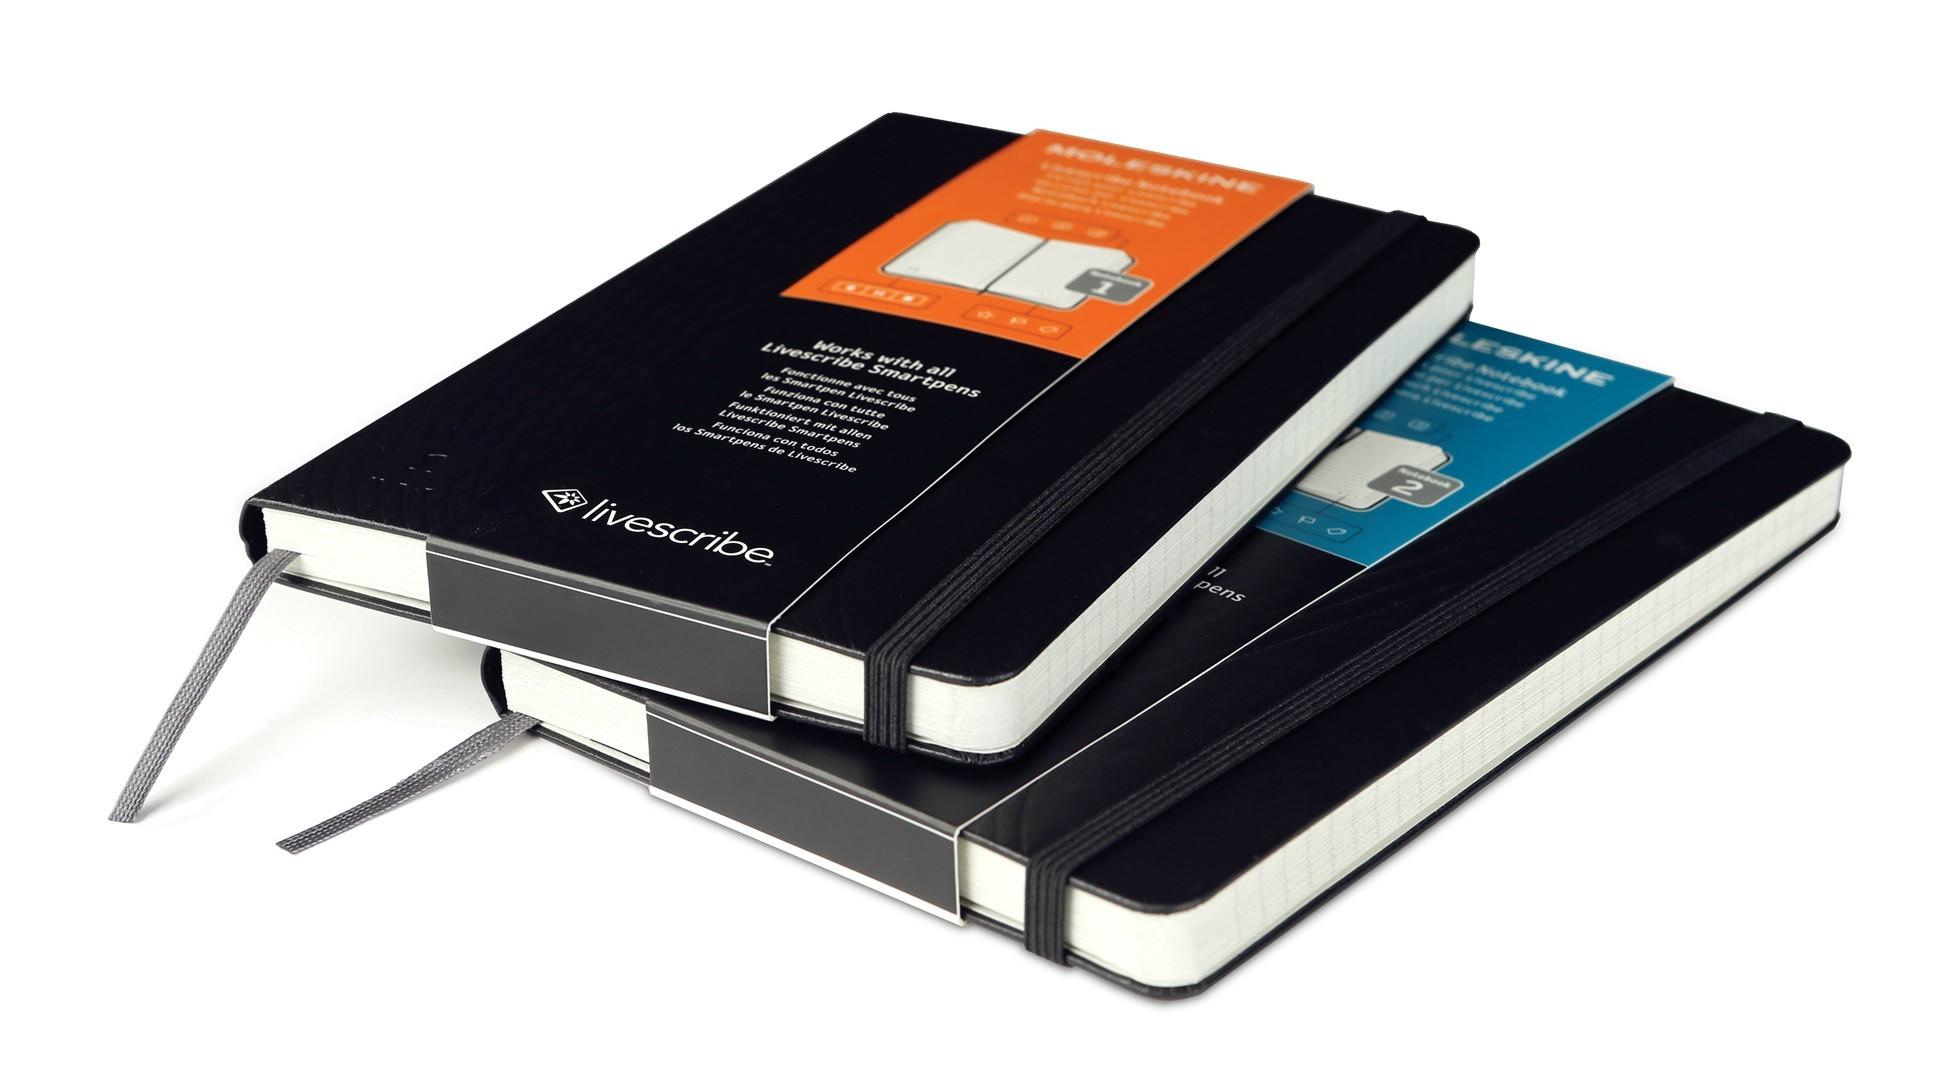 Moleskine Livescribe Notebooks: Analog and Digital ...